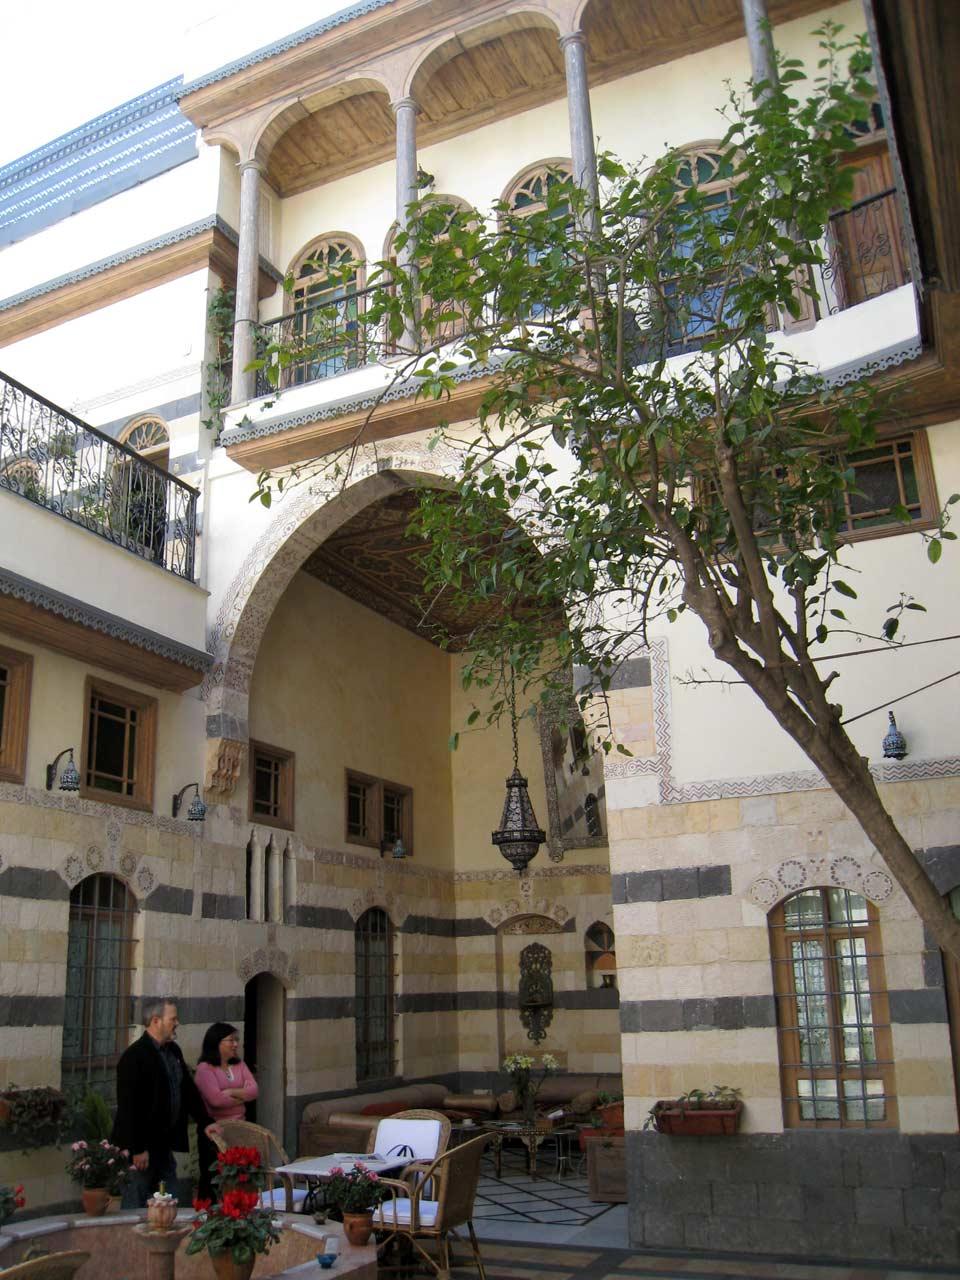 The interior courtyard at Dar Al Mamlouka. © Mark Lowey.